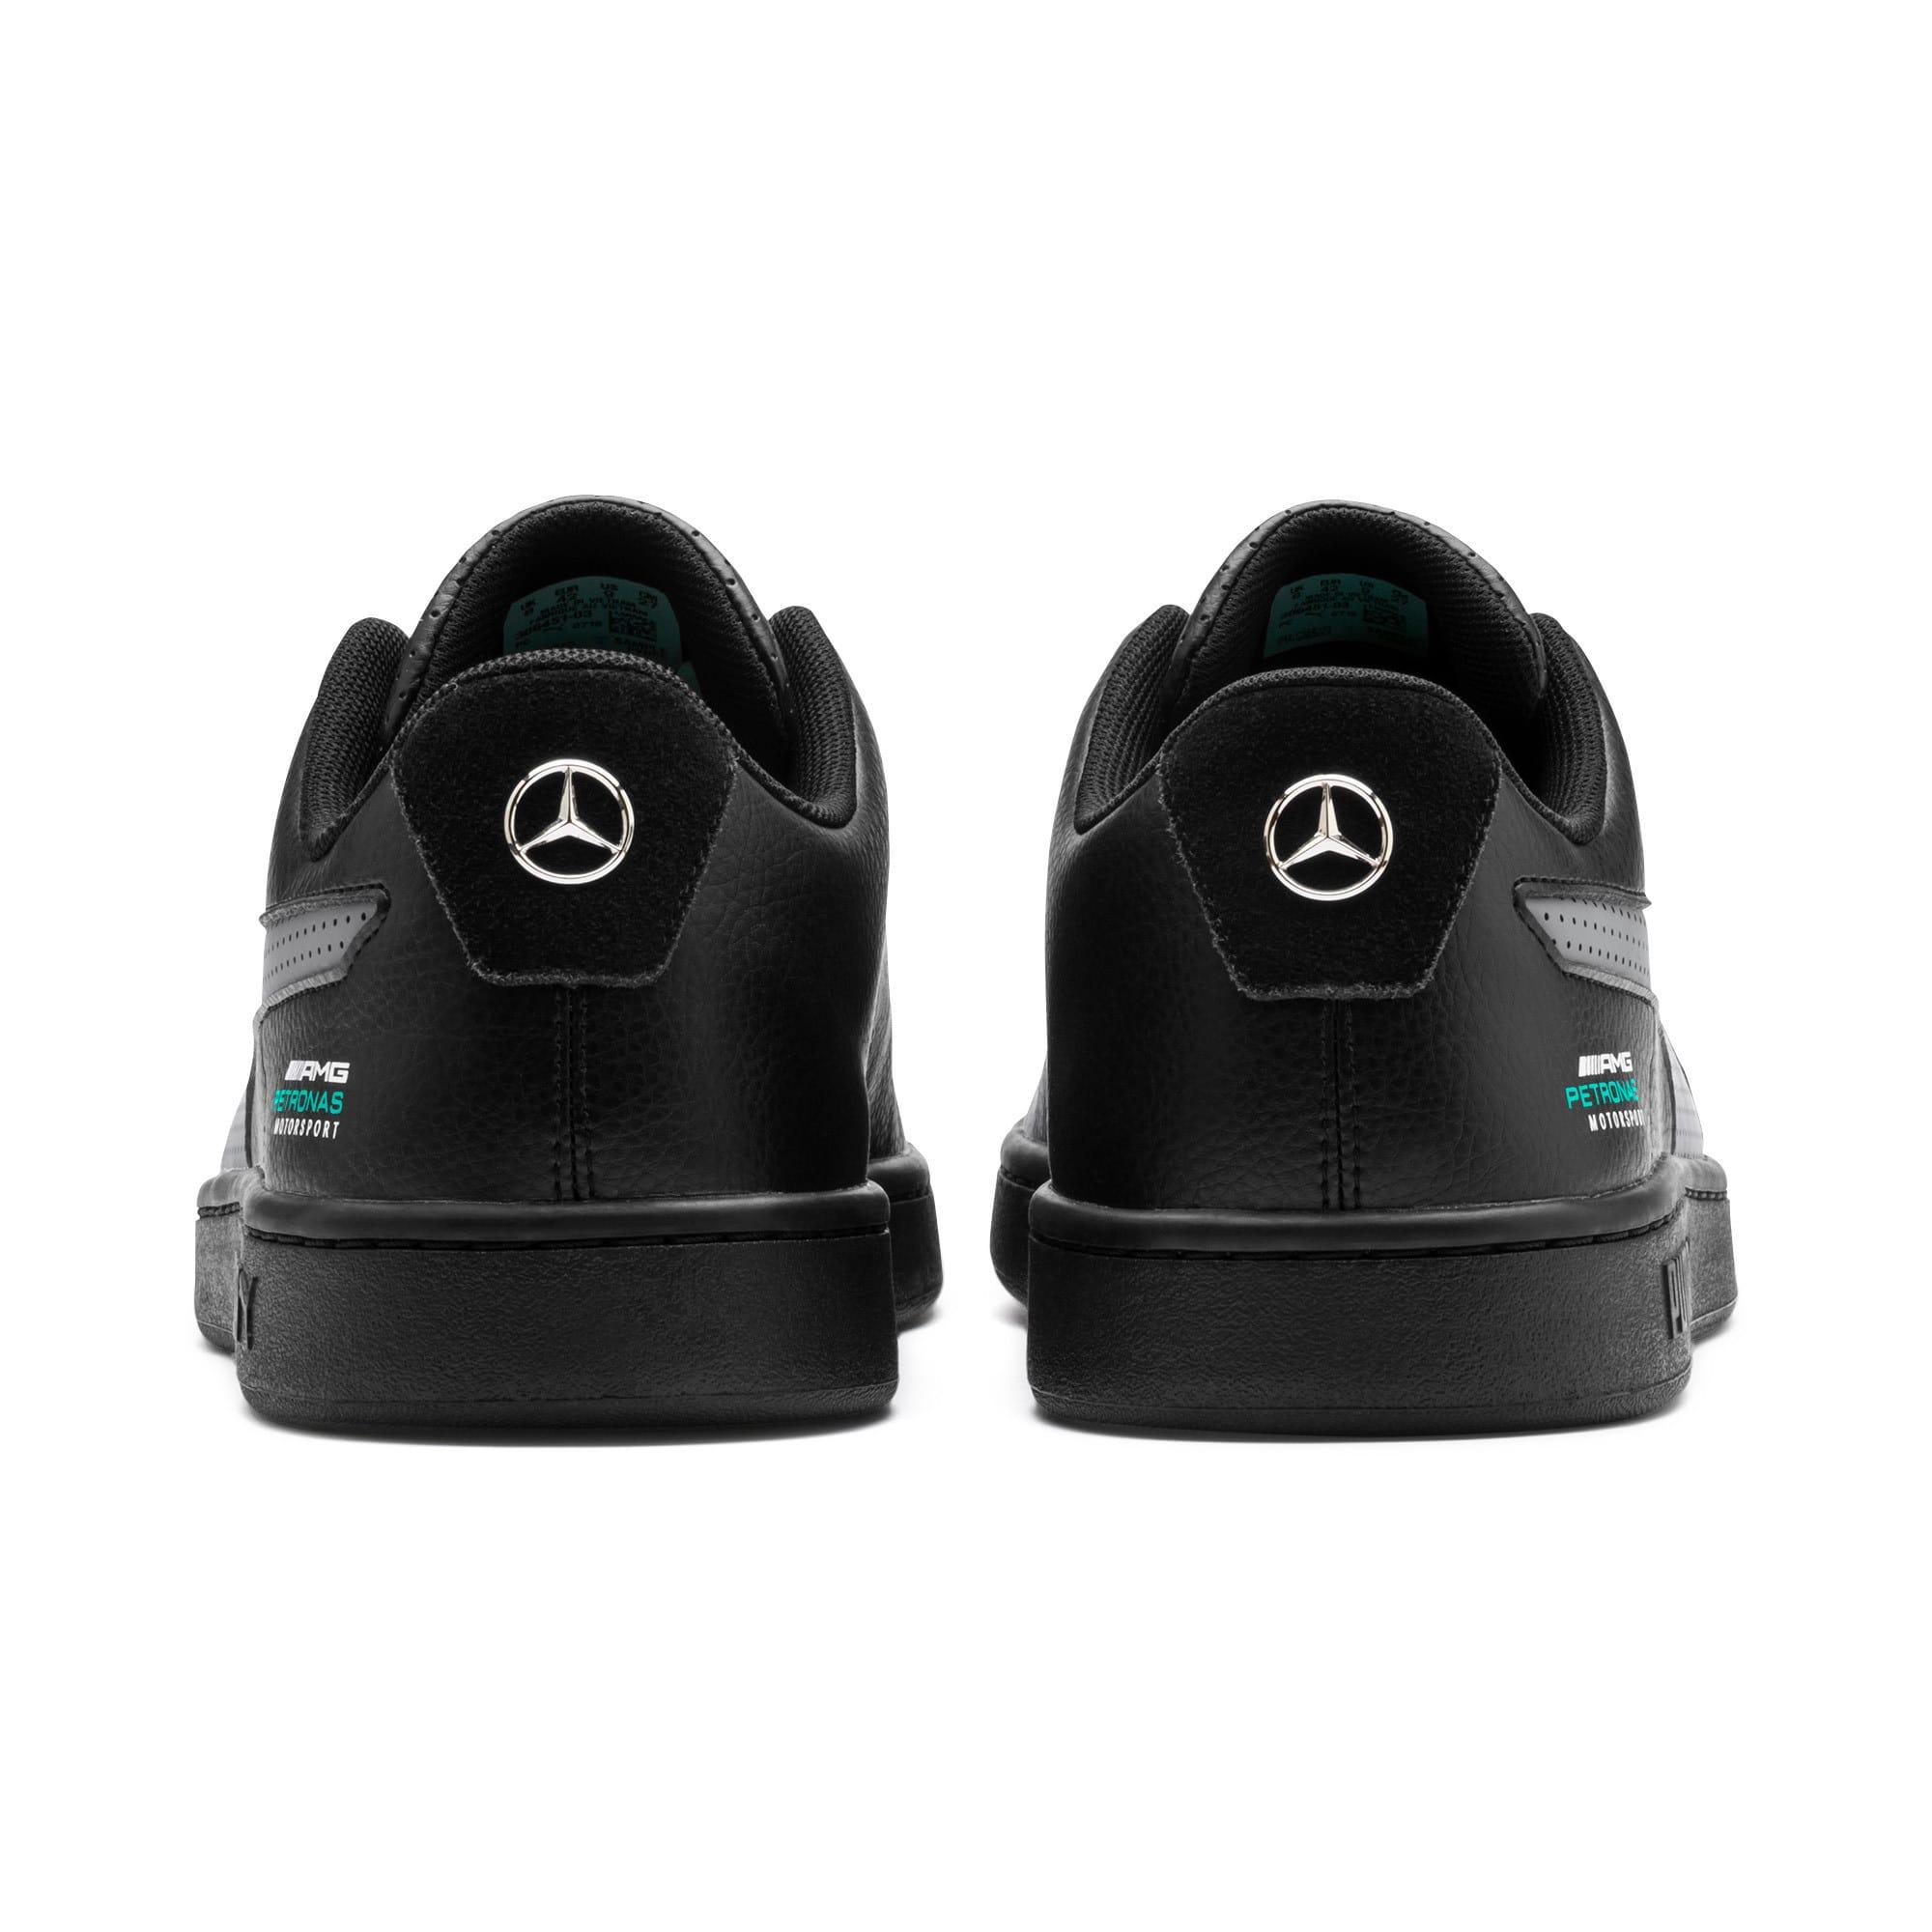 Thumbnail 4 of Mercedes AMG Petronas Smash v2 Sneakers, Black-Smkd Pearl-Spectra Grn, medium